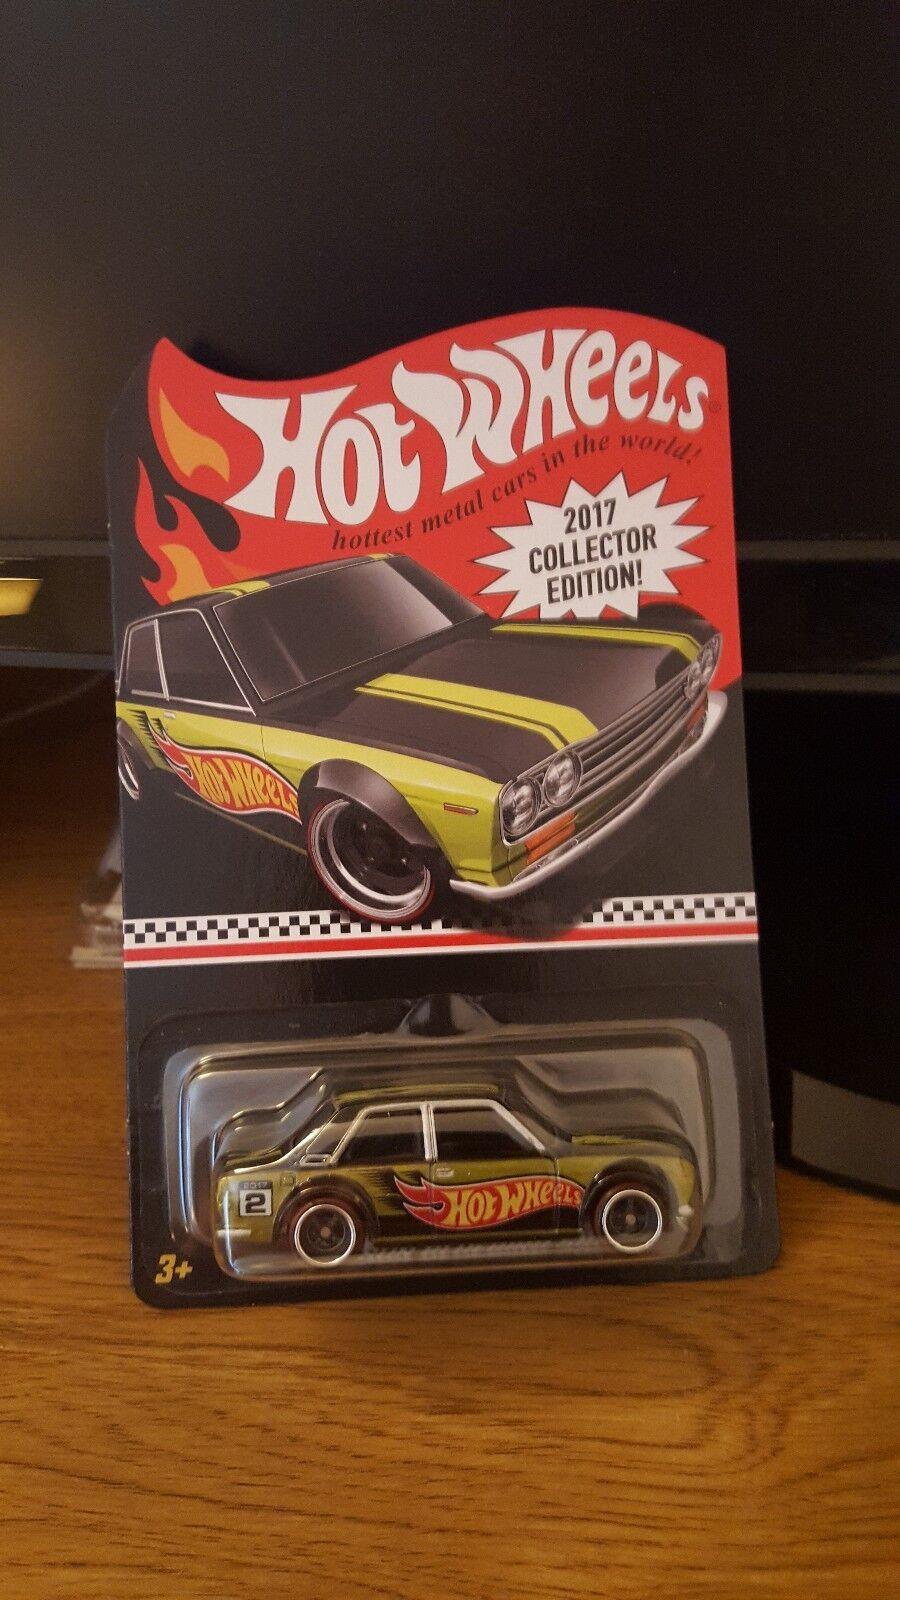 Hot Wheels 2017 collectors edition edition edition Datsun blueebird 510 from Kmart c4ccf6